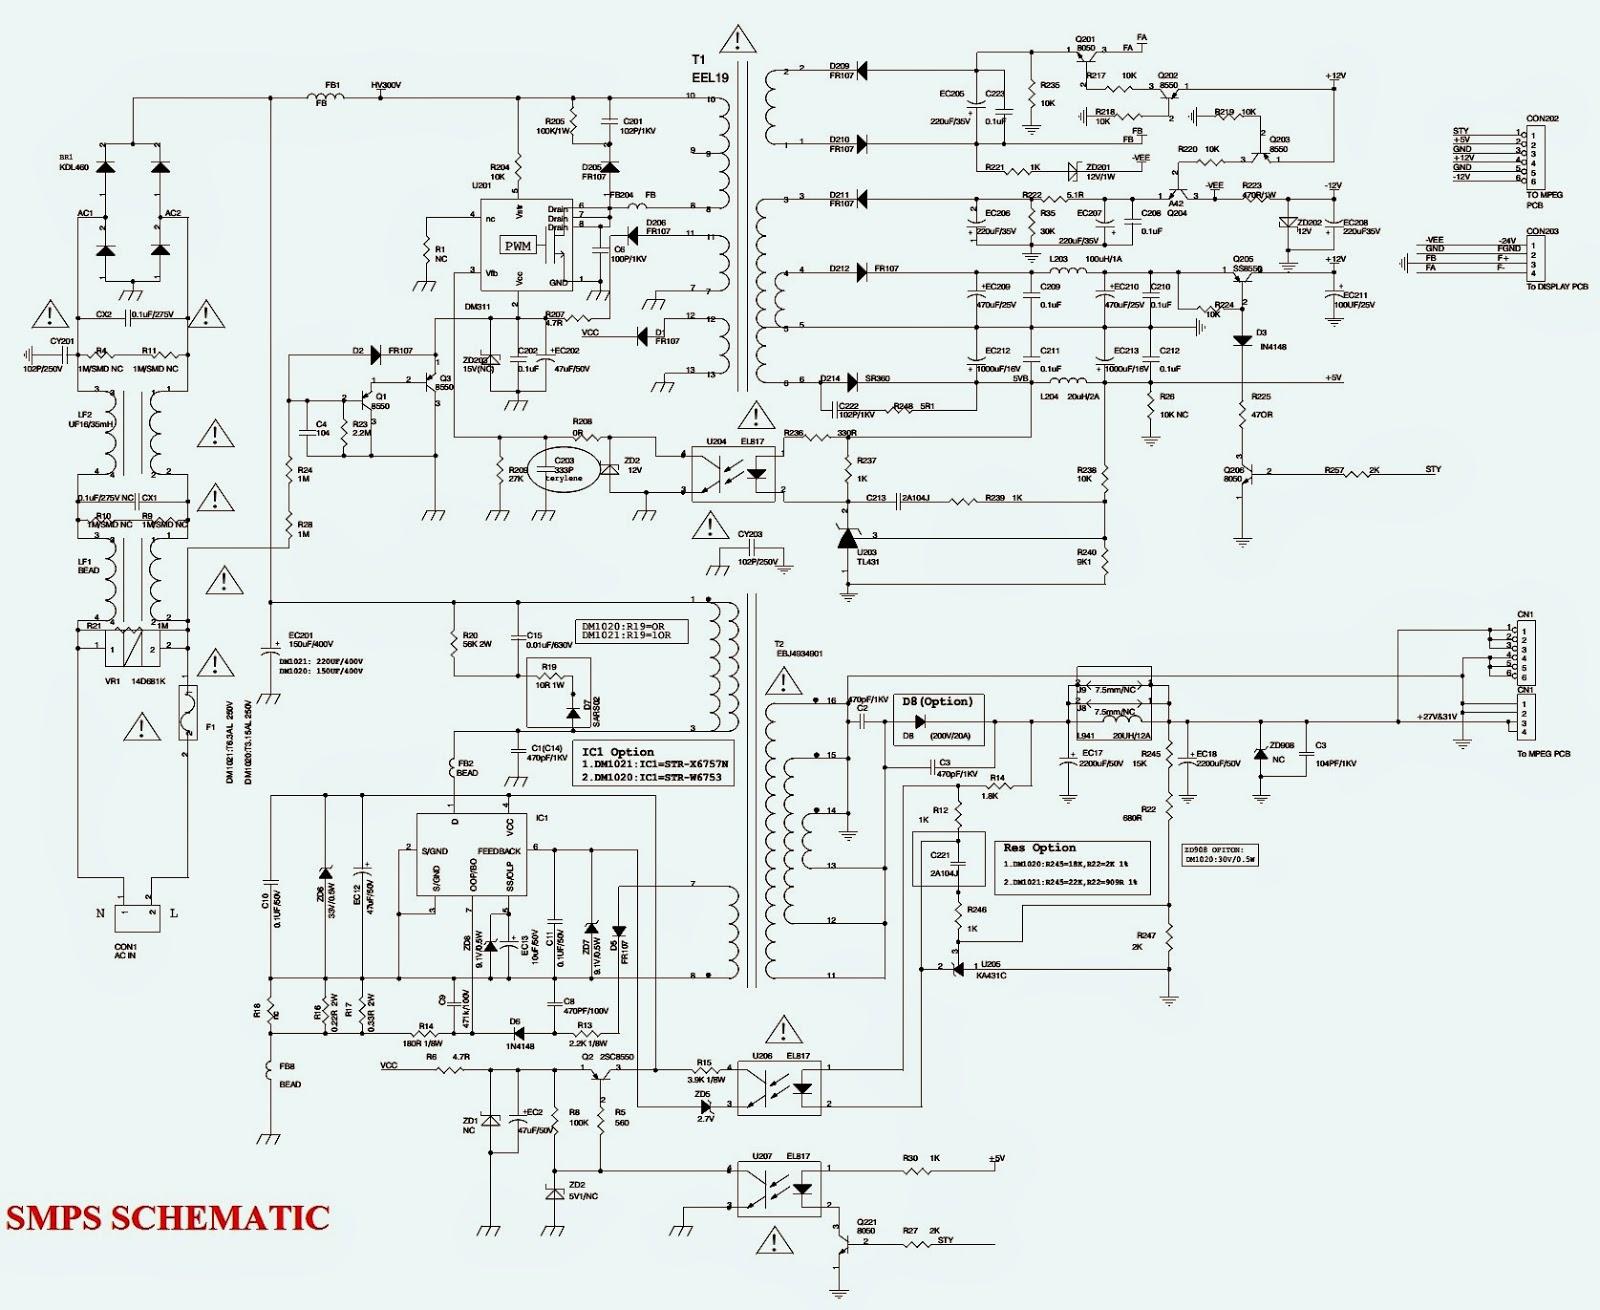 philco mini system ph400n schematic schematic diagrams rh schematicscom blogspot com